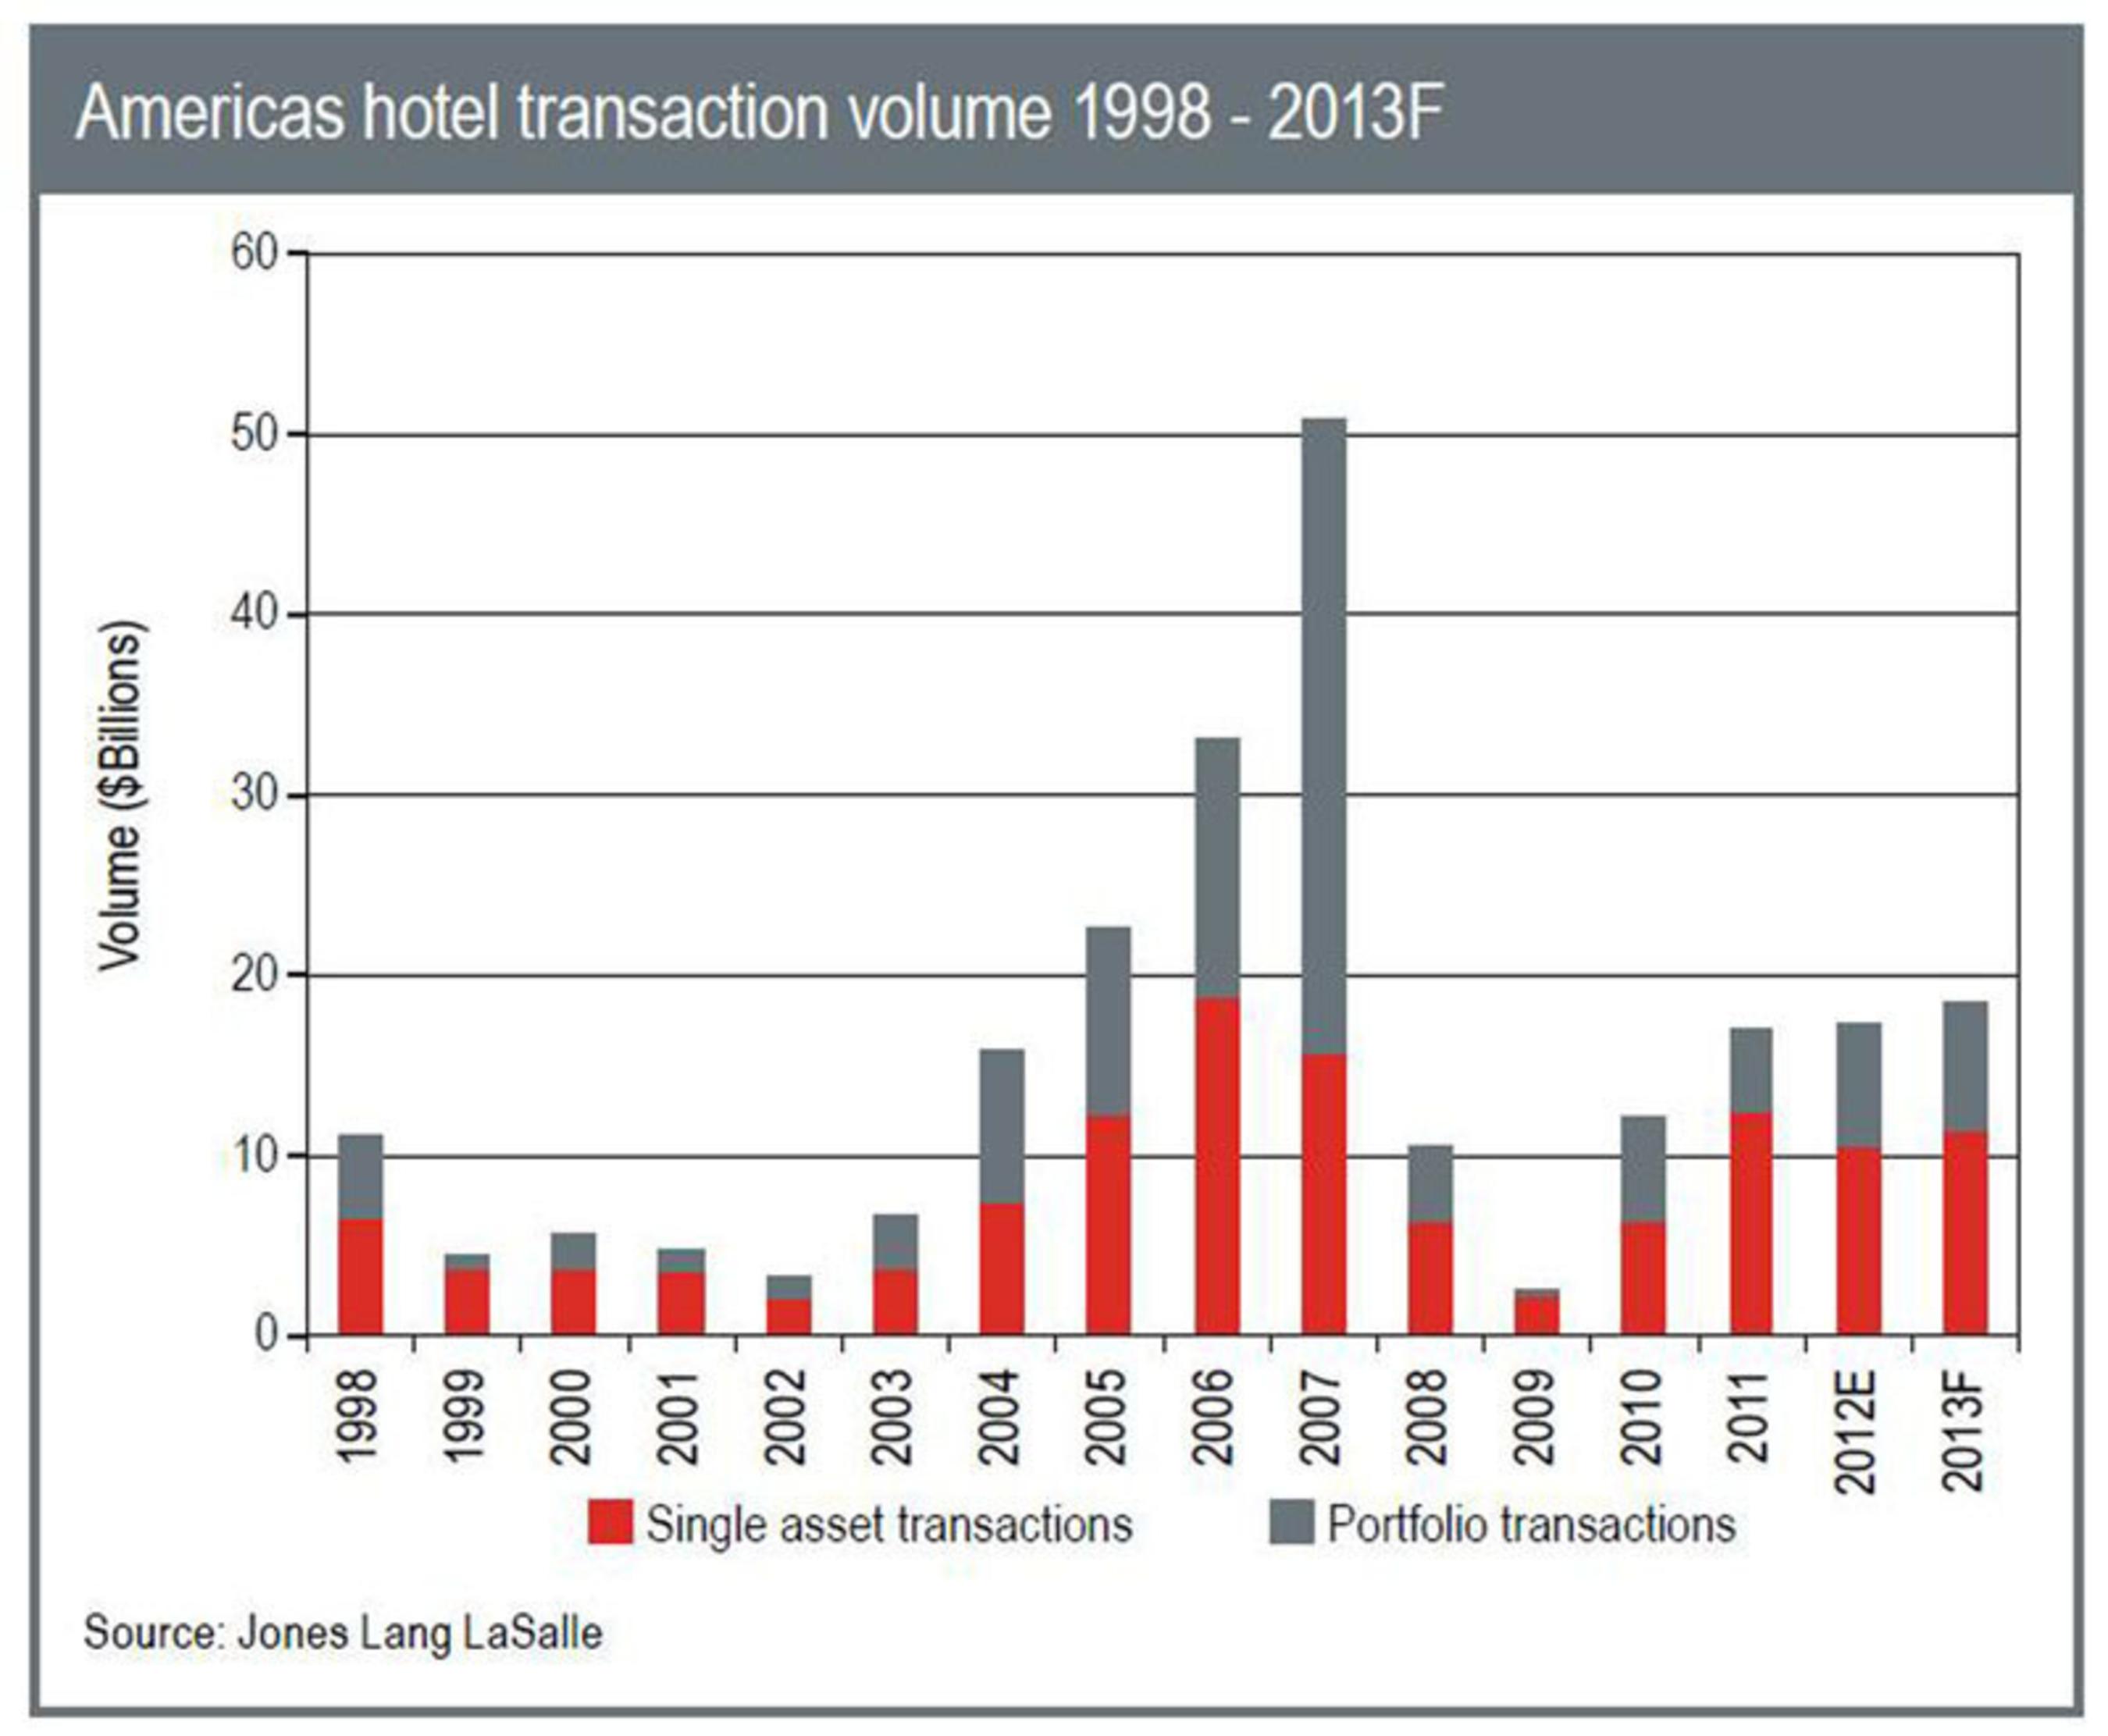 Americas Hotel Transaction Volume to Eclipse 2012 at $18.5 Billion in 2013